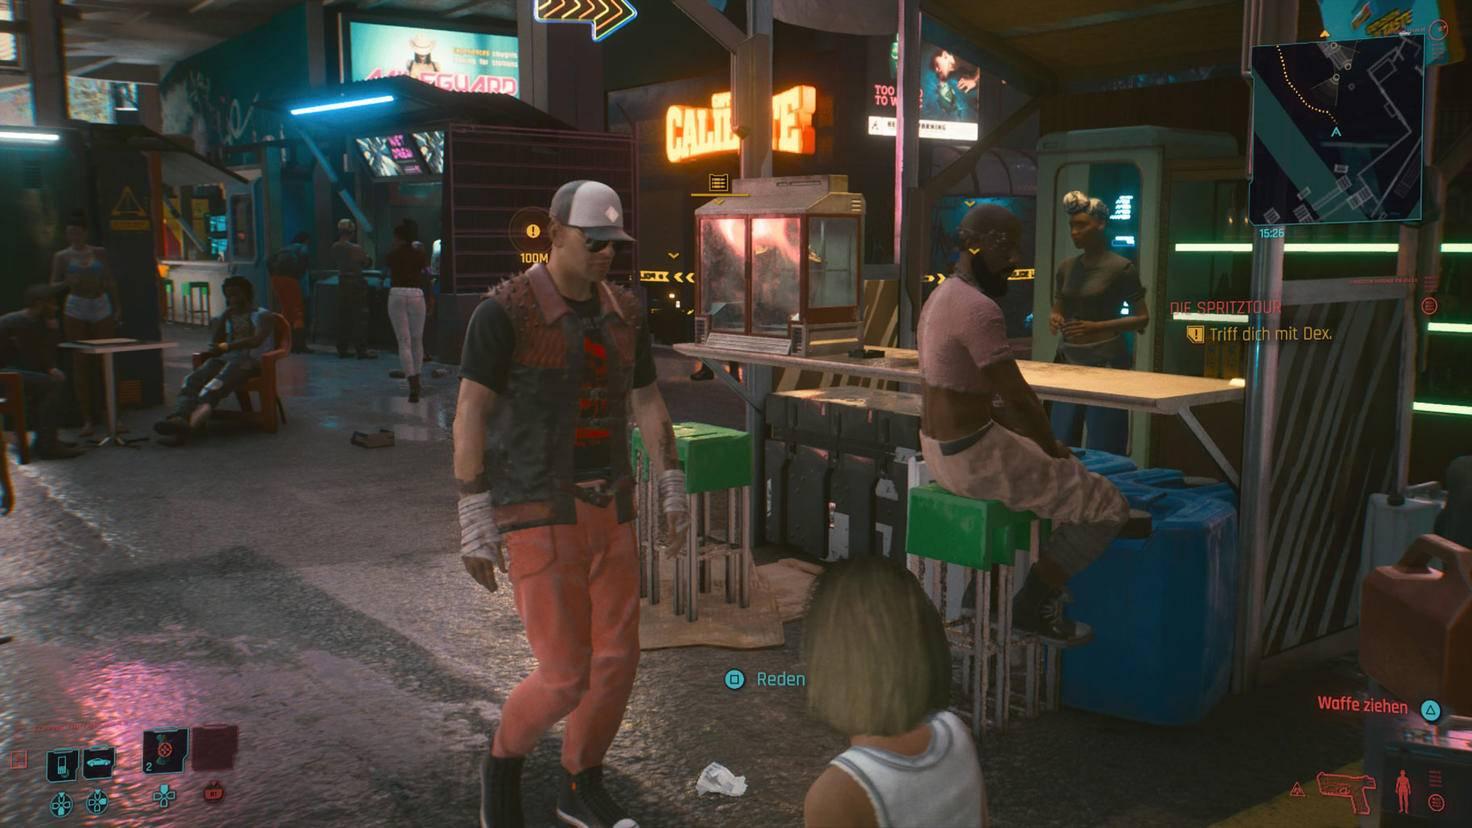 cyberpunk-2077-ps5-screenshot-01